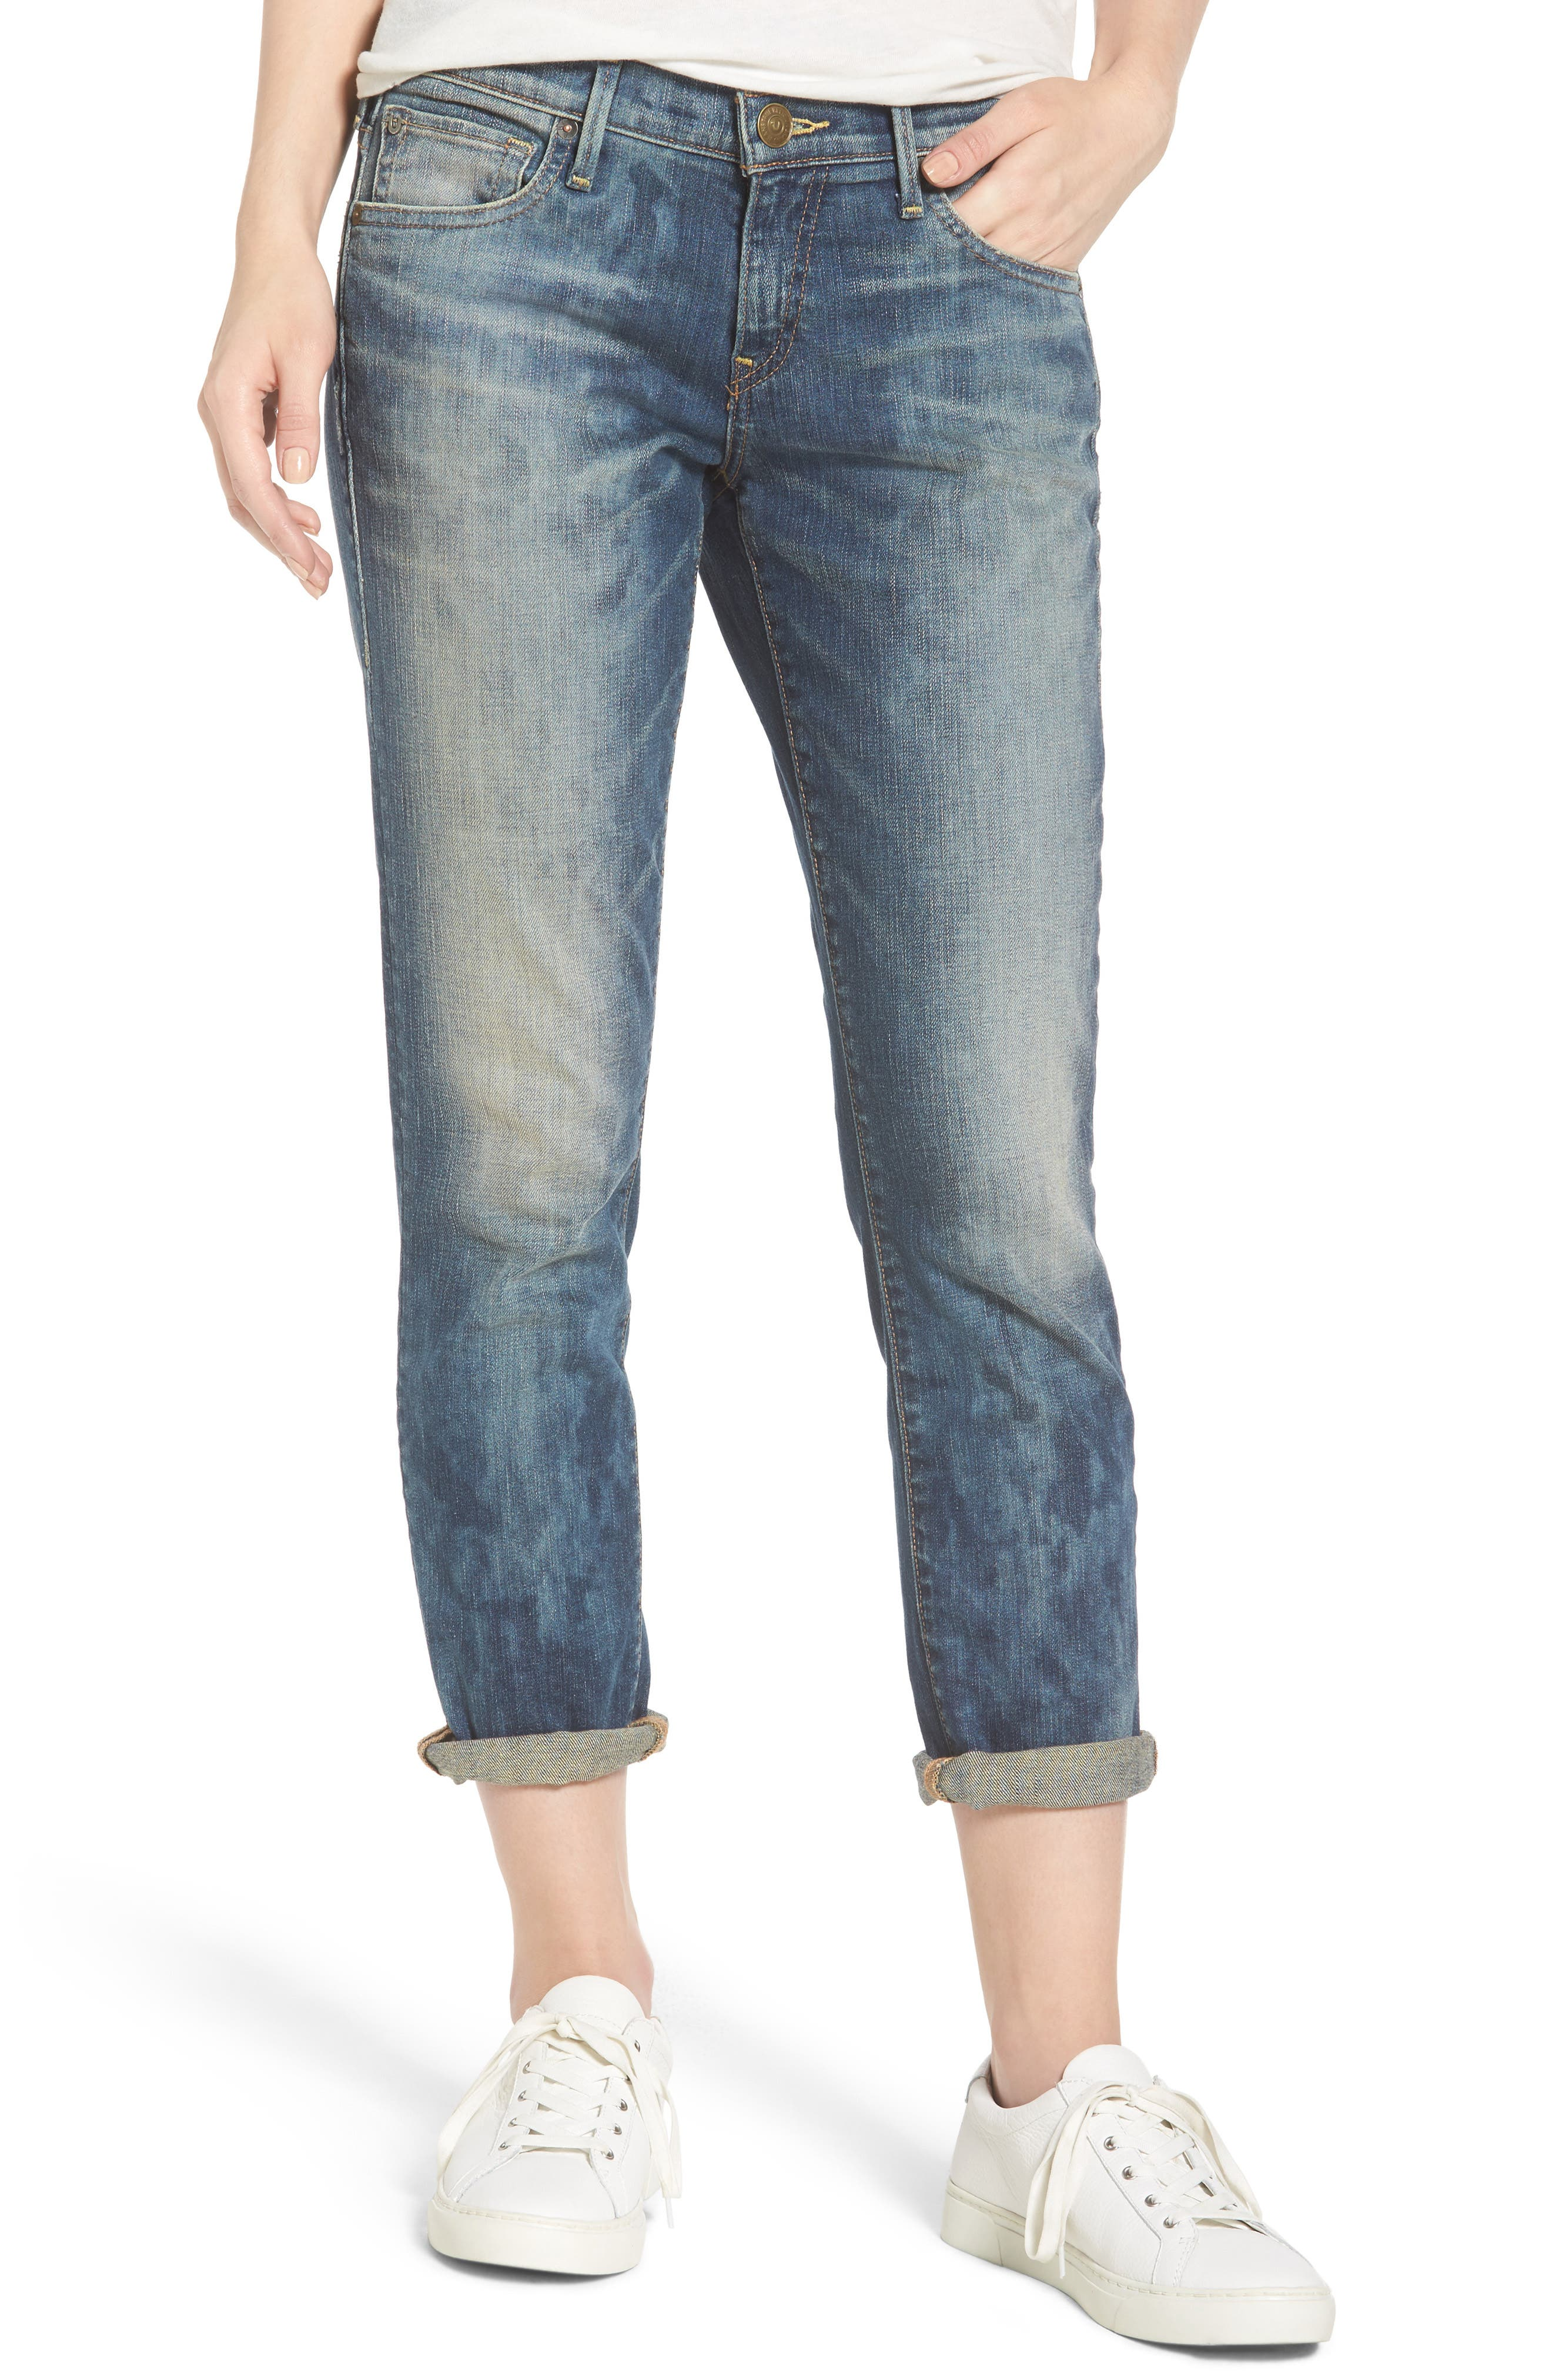 Main Image - True Religion Brand Jeans Cameron Slim Boyfriend Jeans (Distillery)